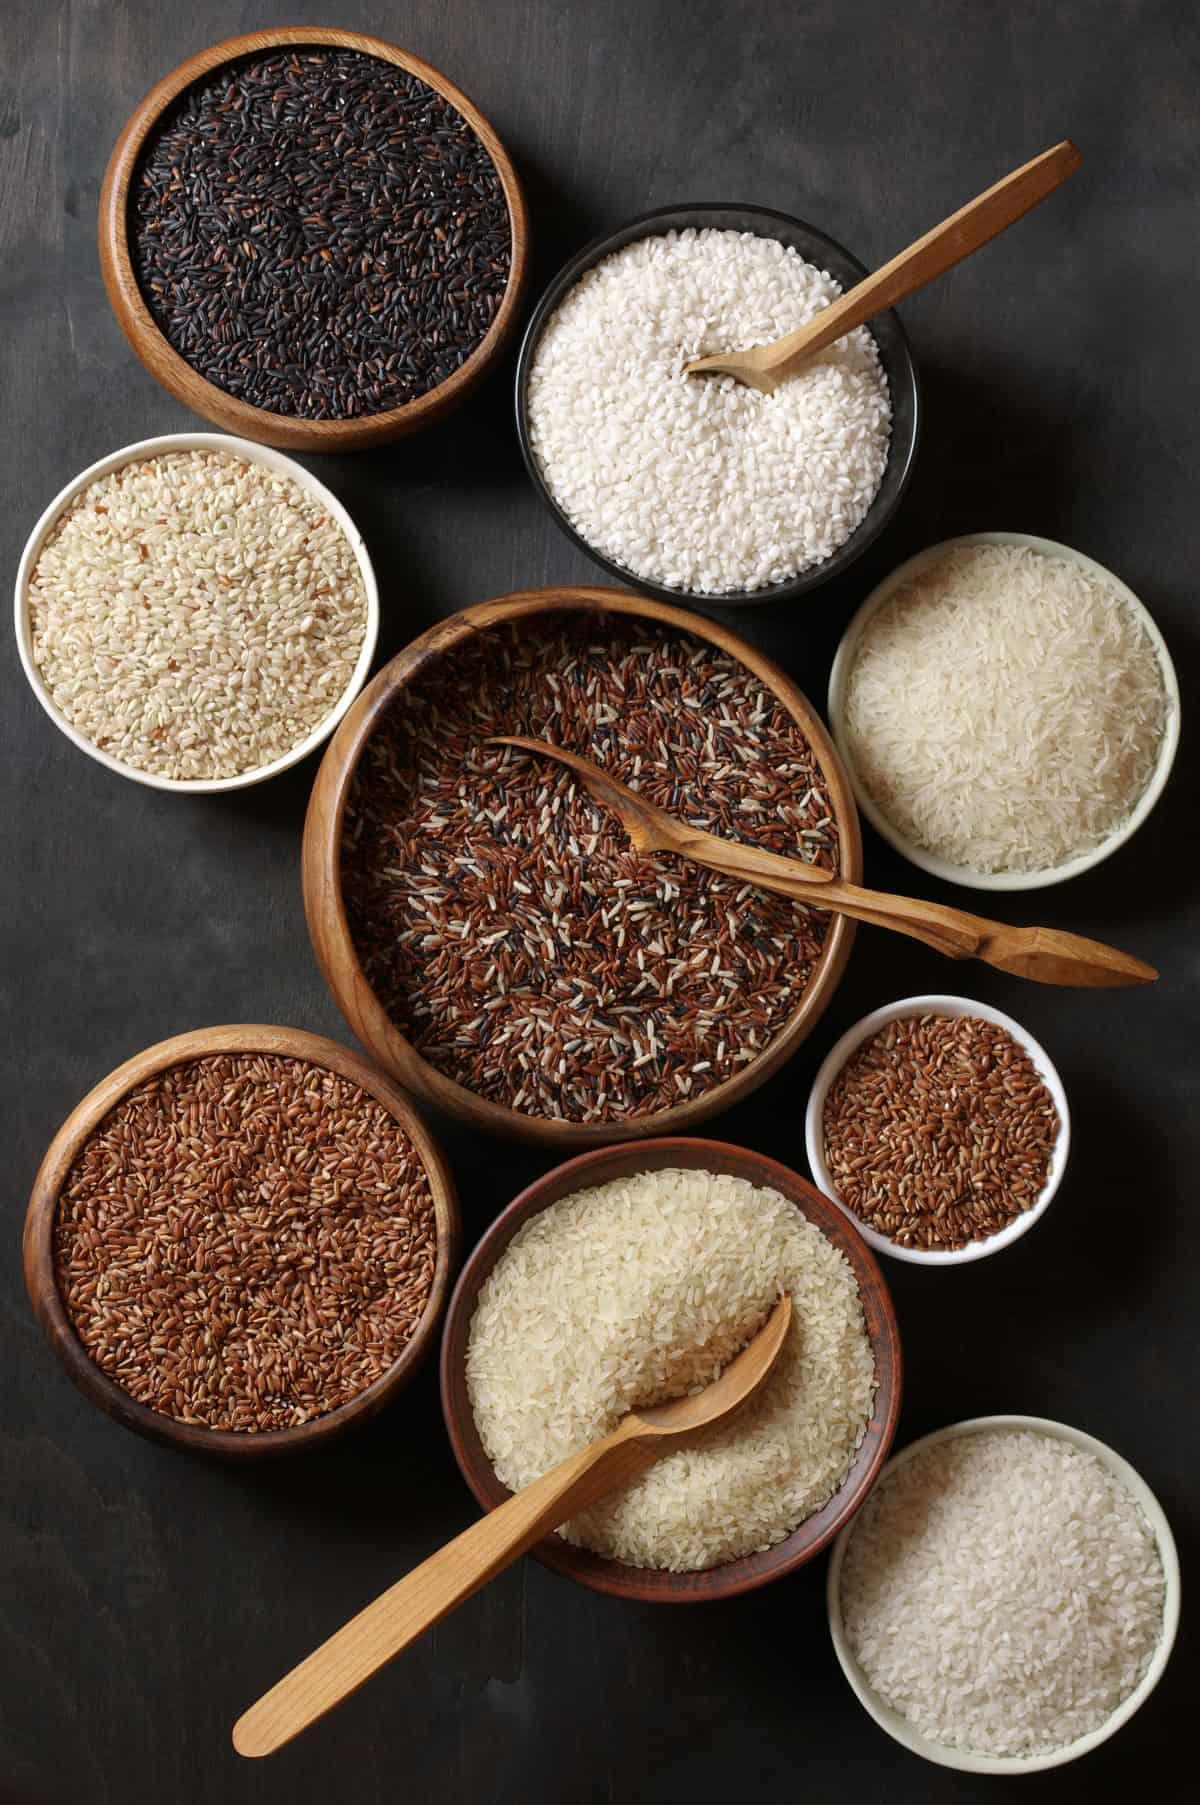 Rice varieties arrayed in individual bowls.